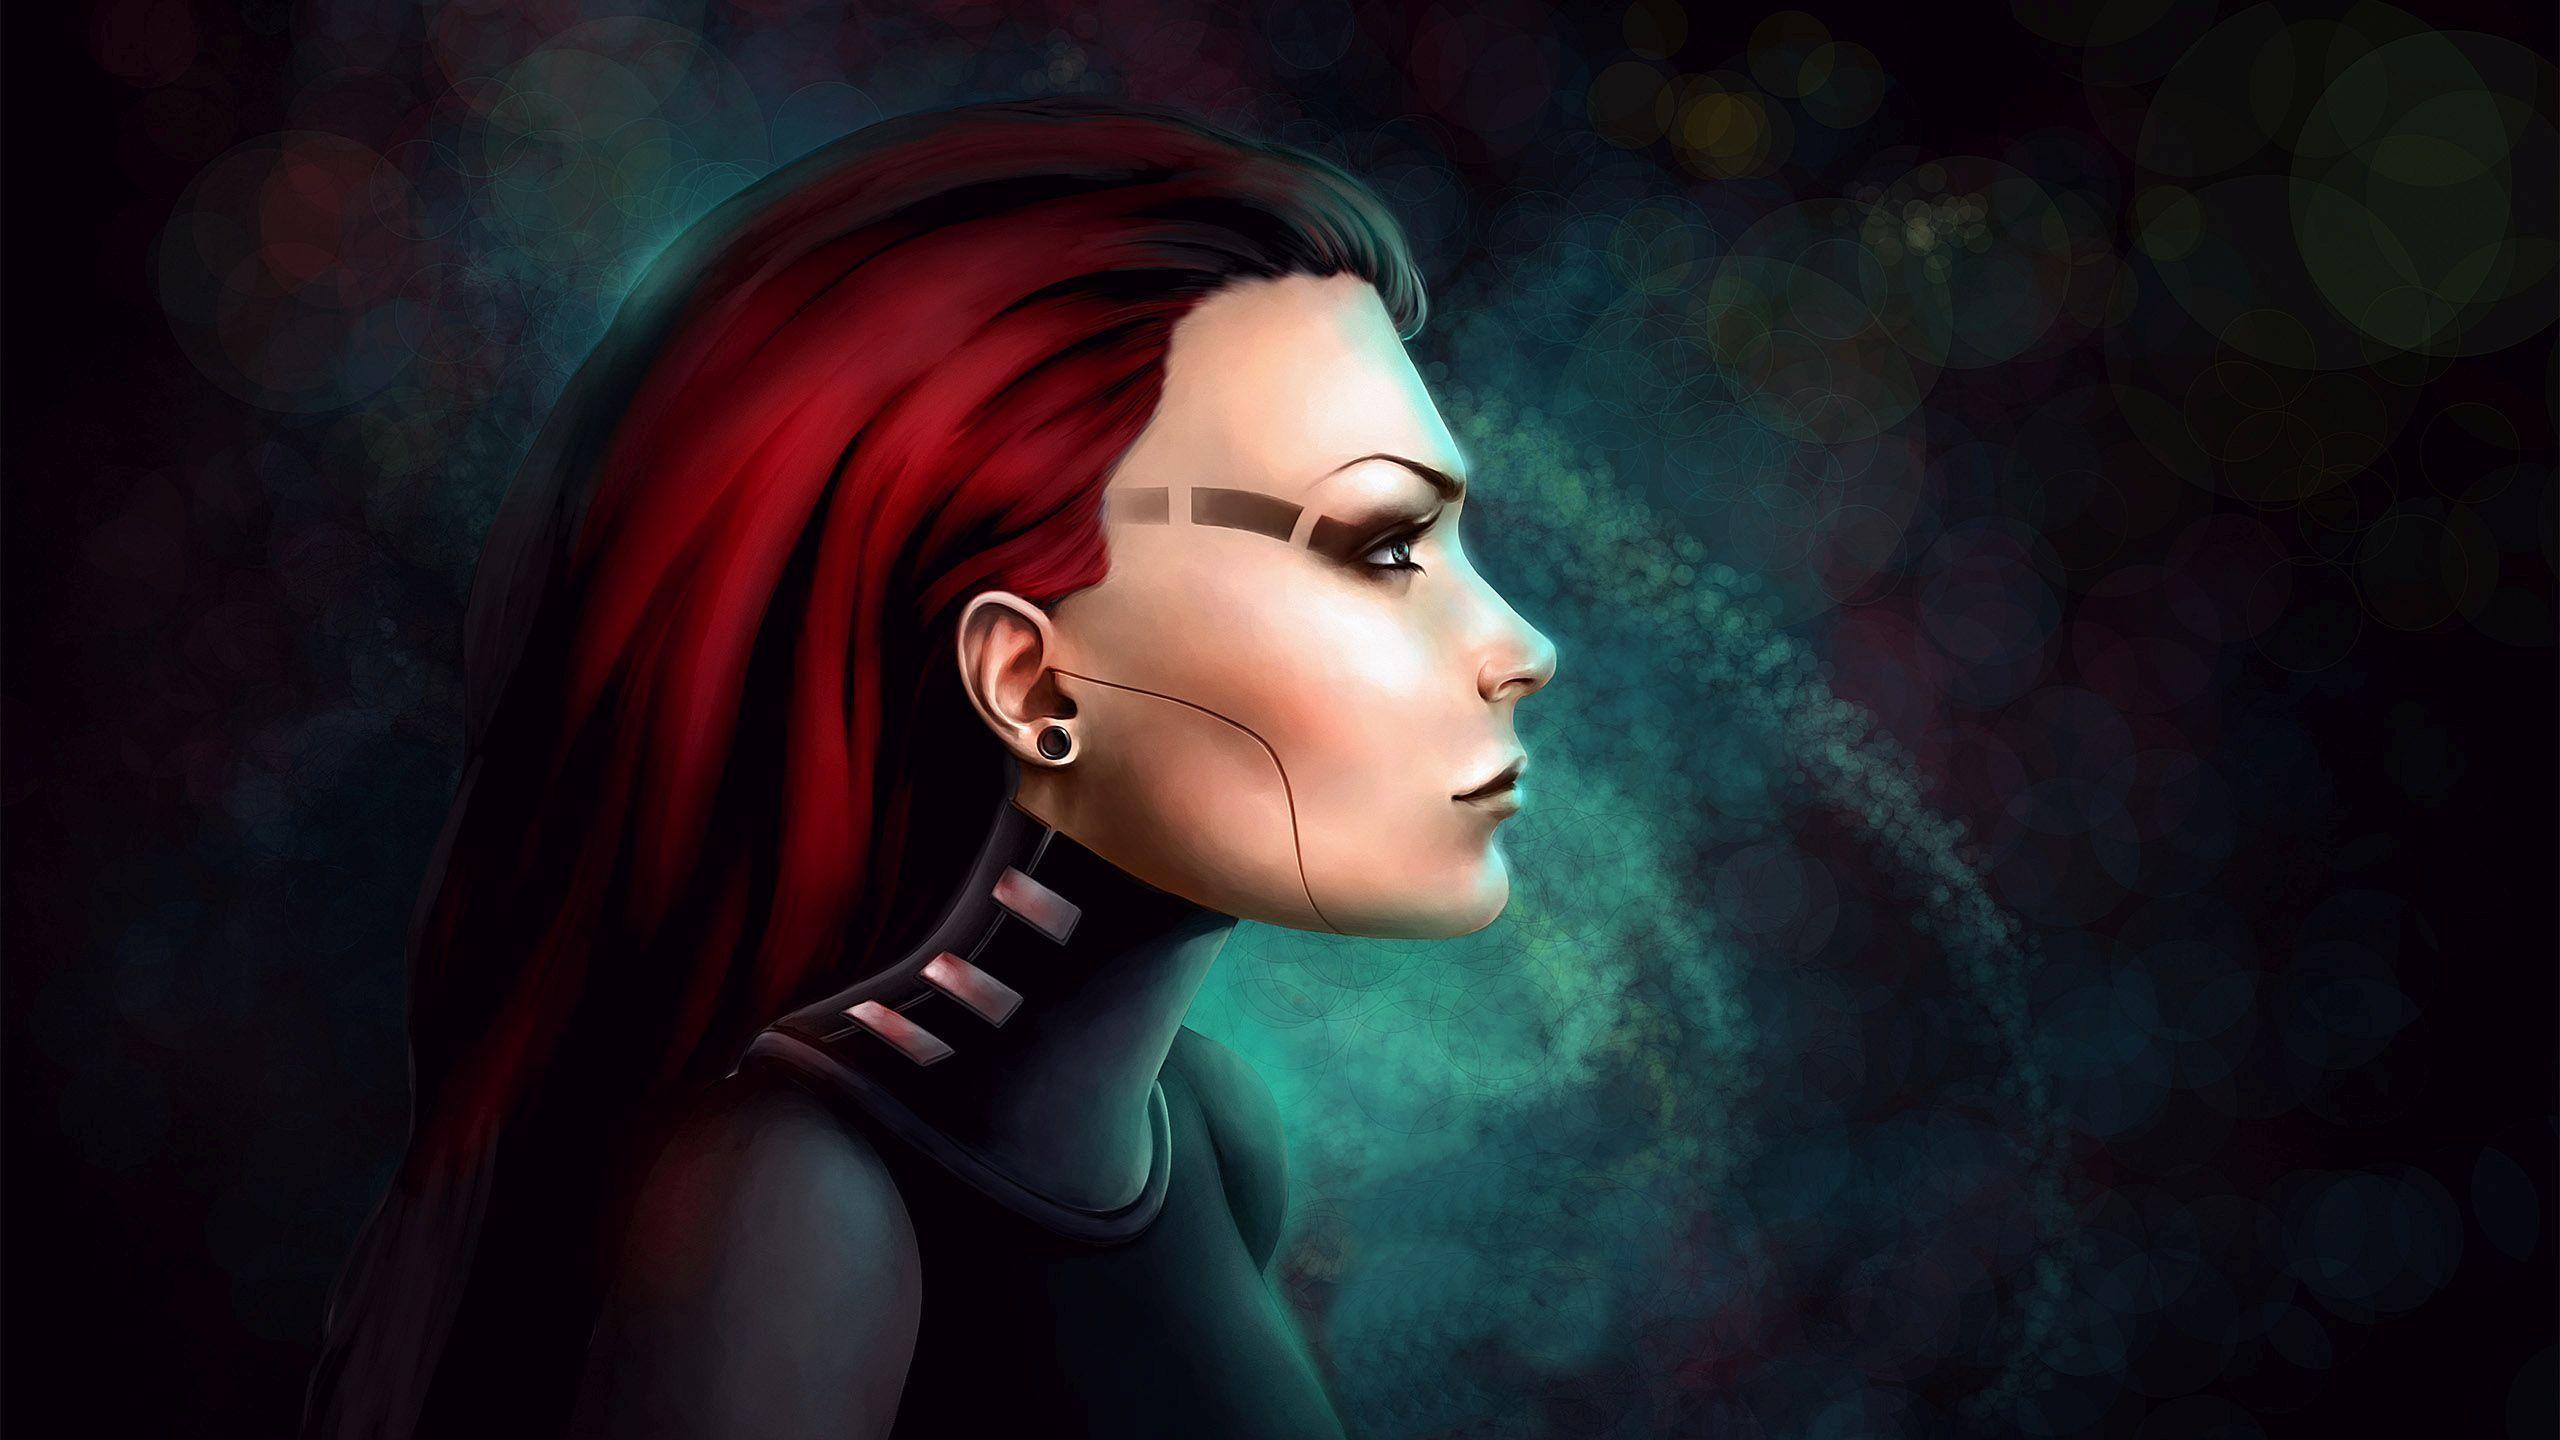 HD Cyborg redhead Wallpaper